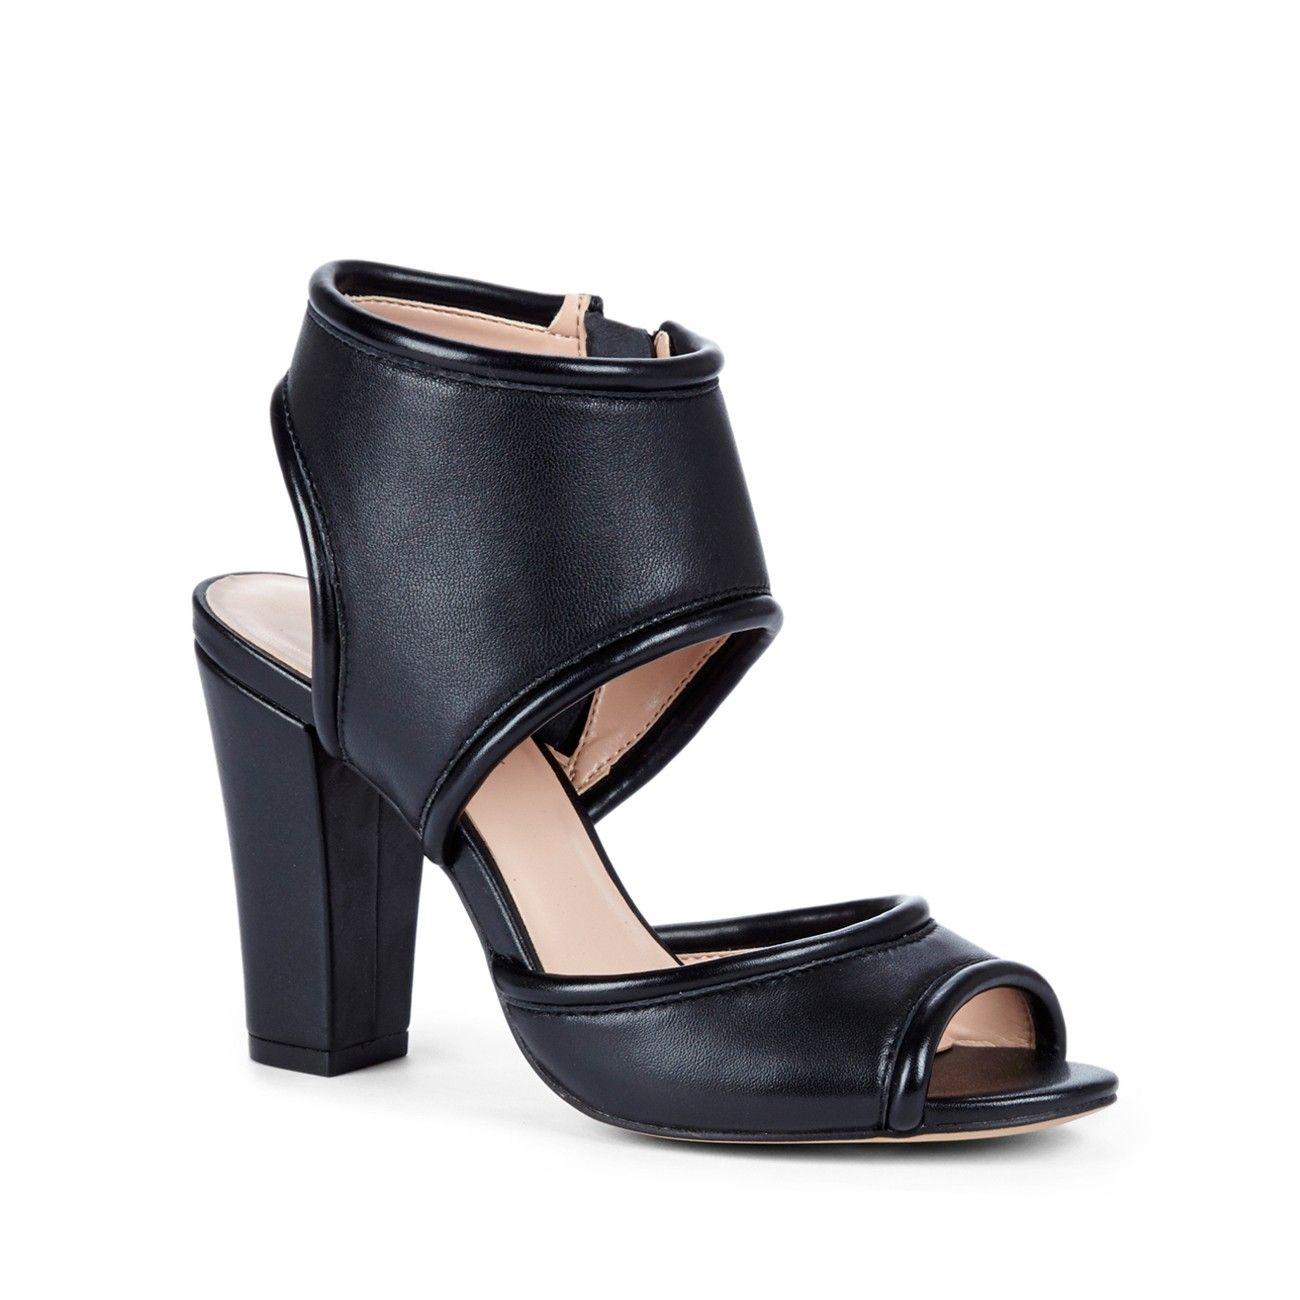 c713bd2da7b Sole Society - Gayle Sandals (worn by Aria Montgomery on Pretty Little  Liars)